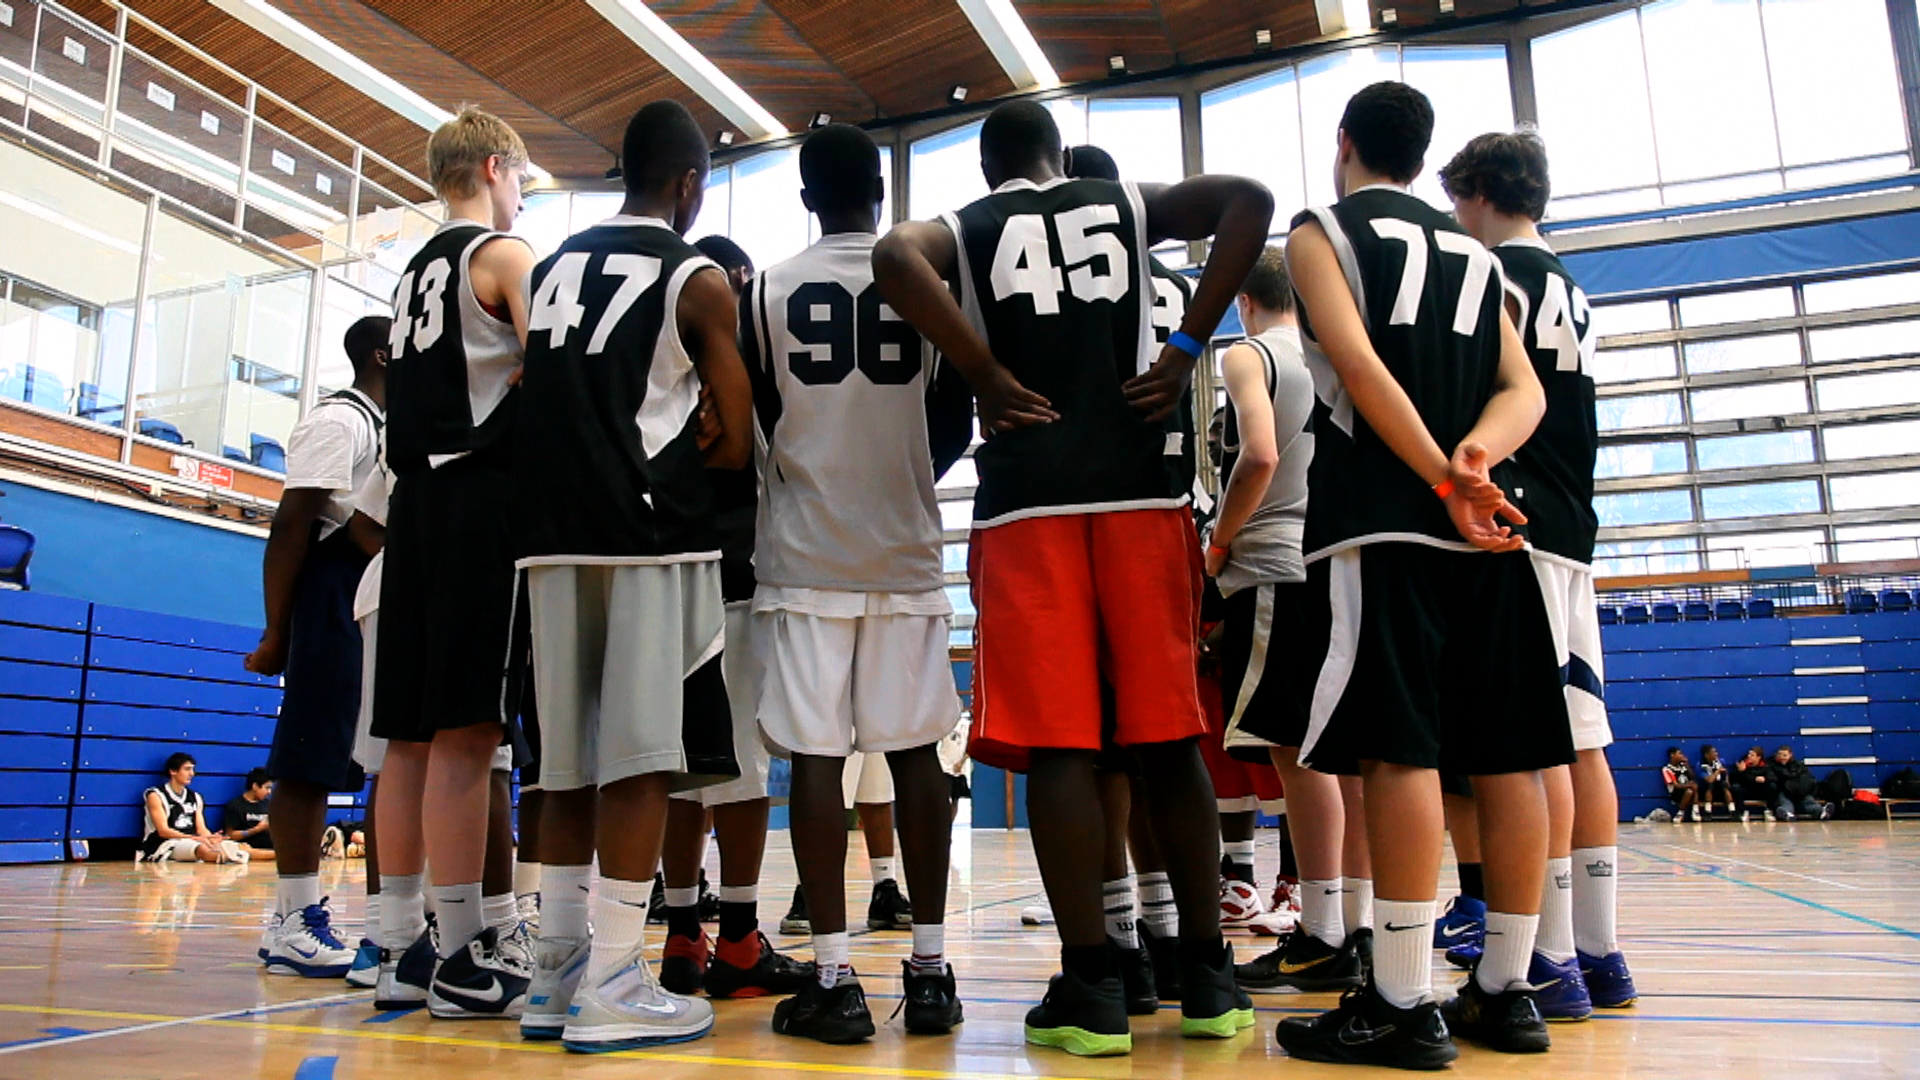 CHOOSE PlusPng.com  - Basketball Team Huddle PNG